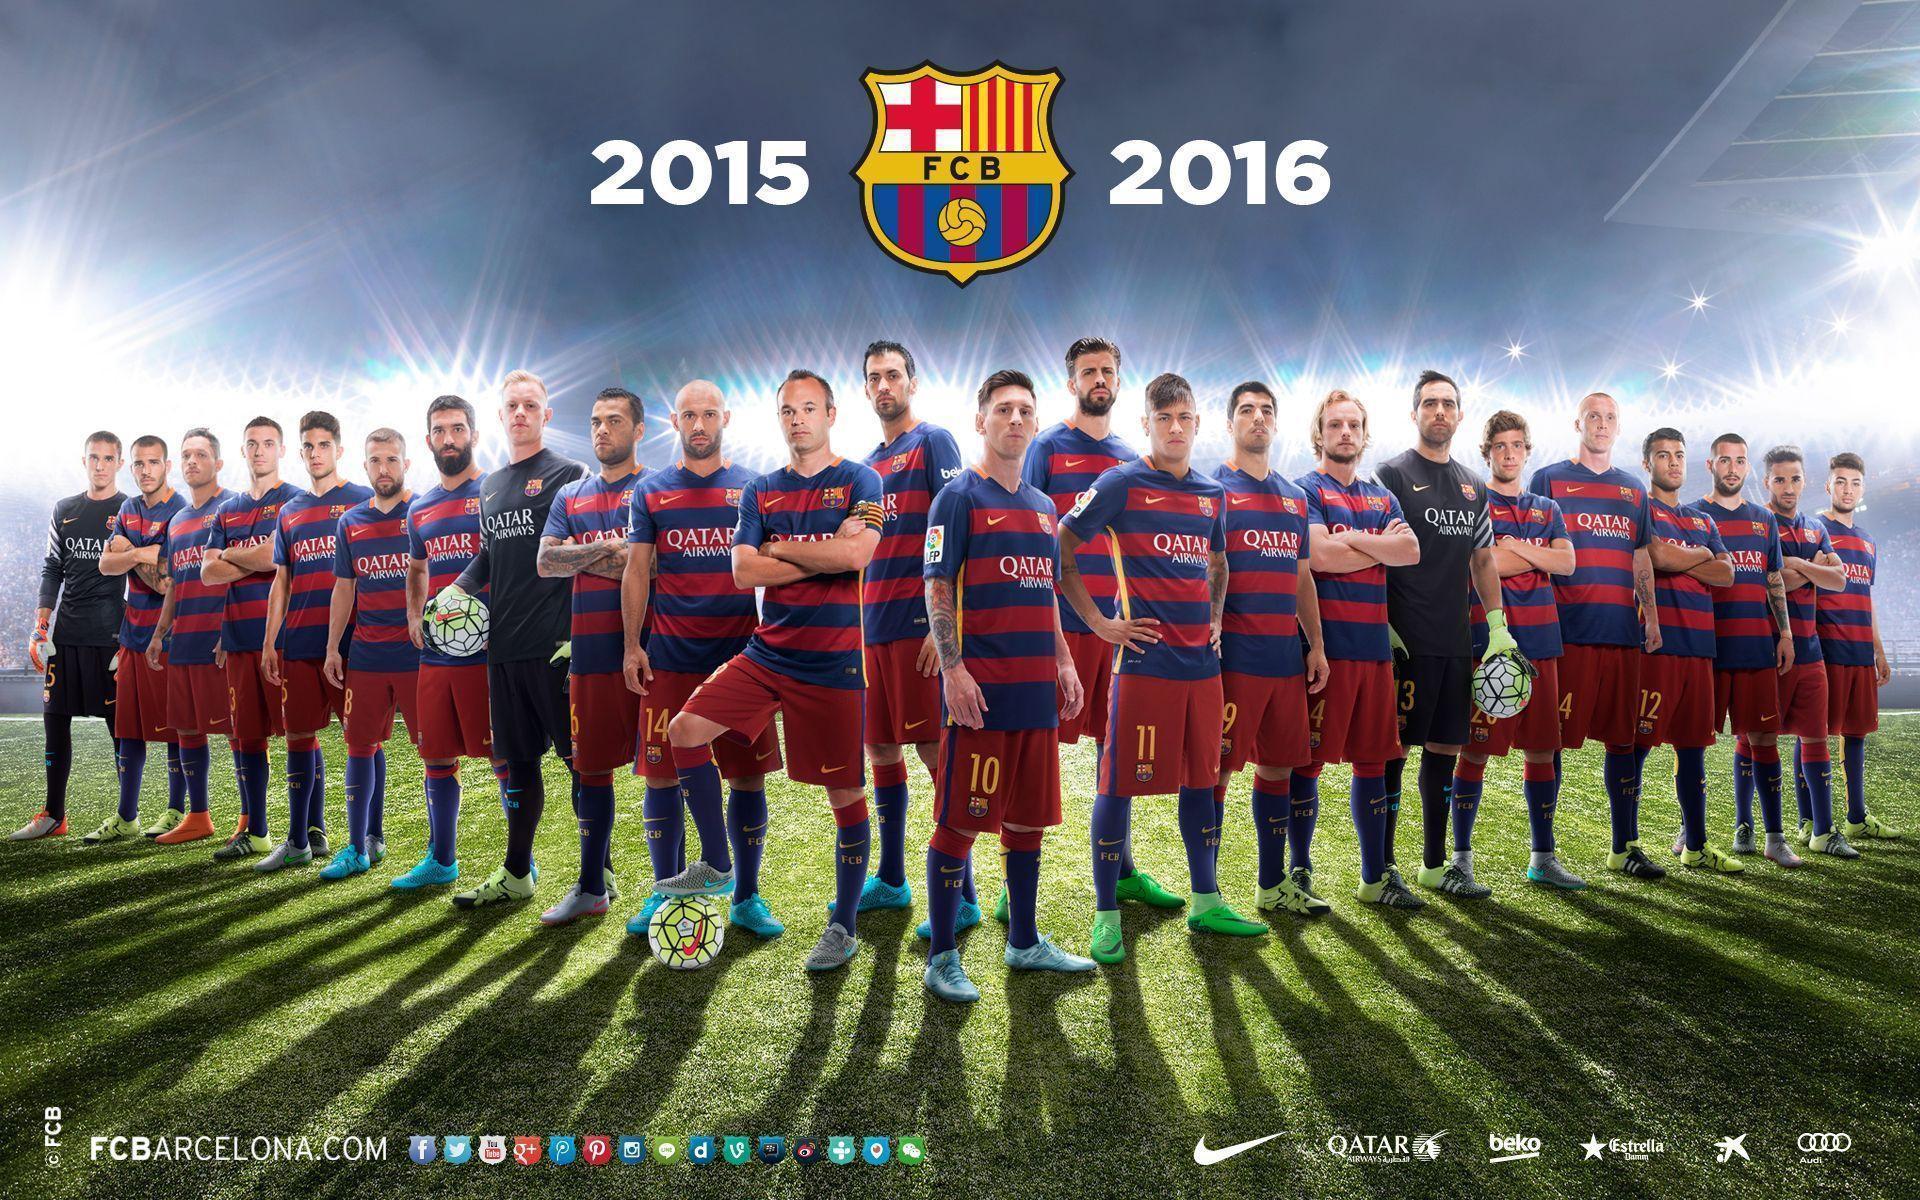 FC Barcelona Wallpapers 2016 1920x1200